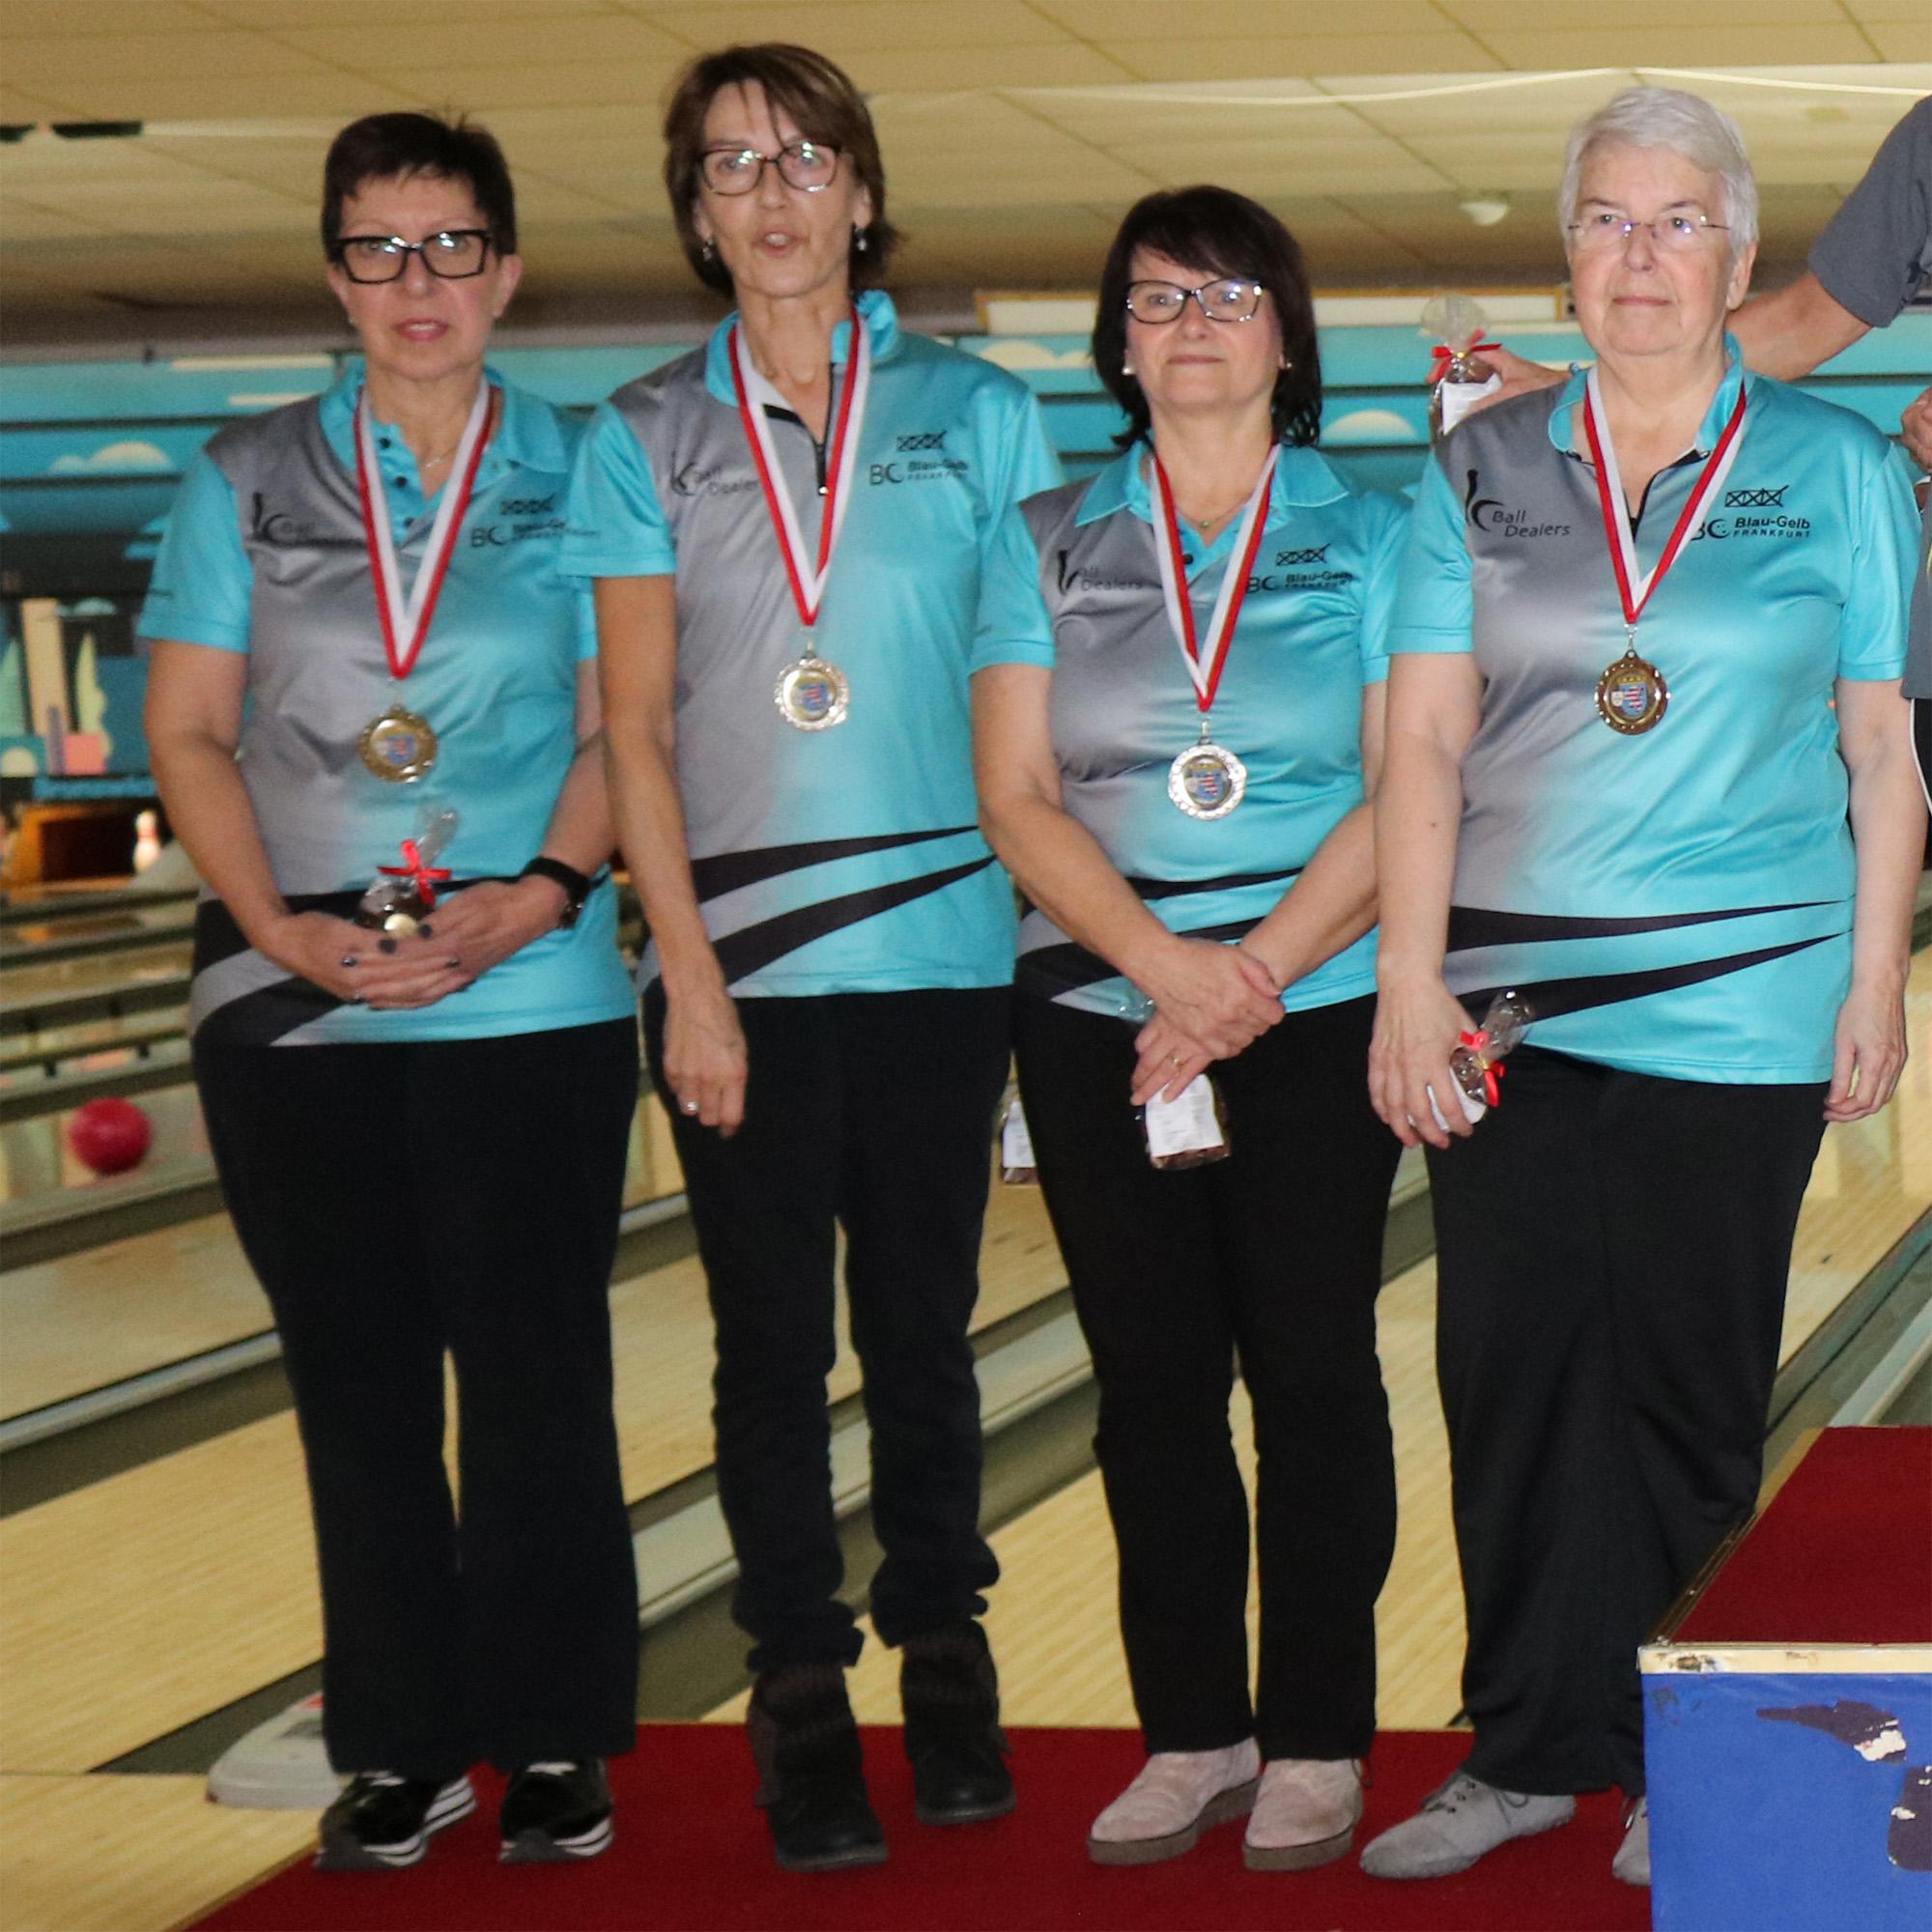 Platz 2 Seniorinnen B: Petra, Geli, Edith und Petra (v.l.)